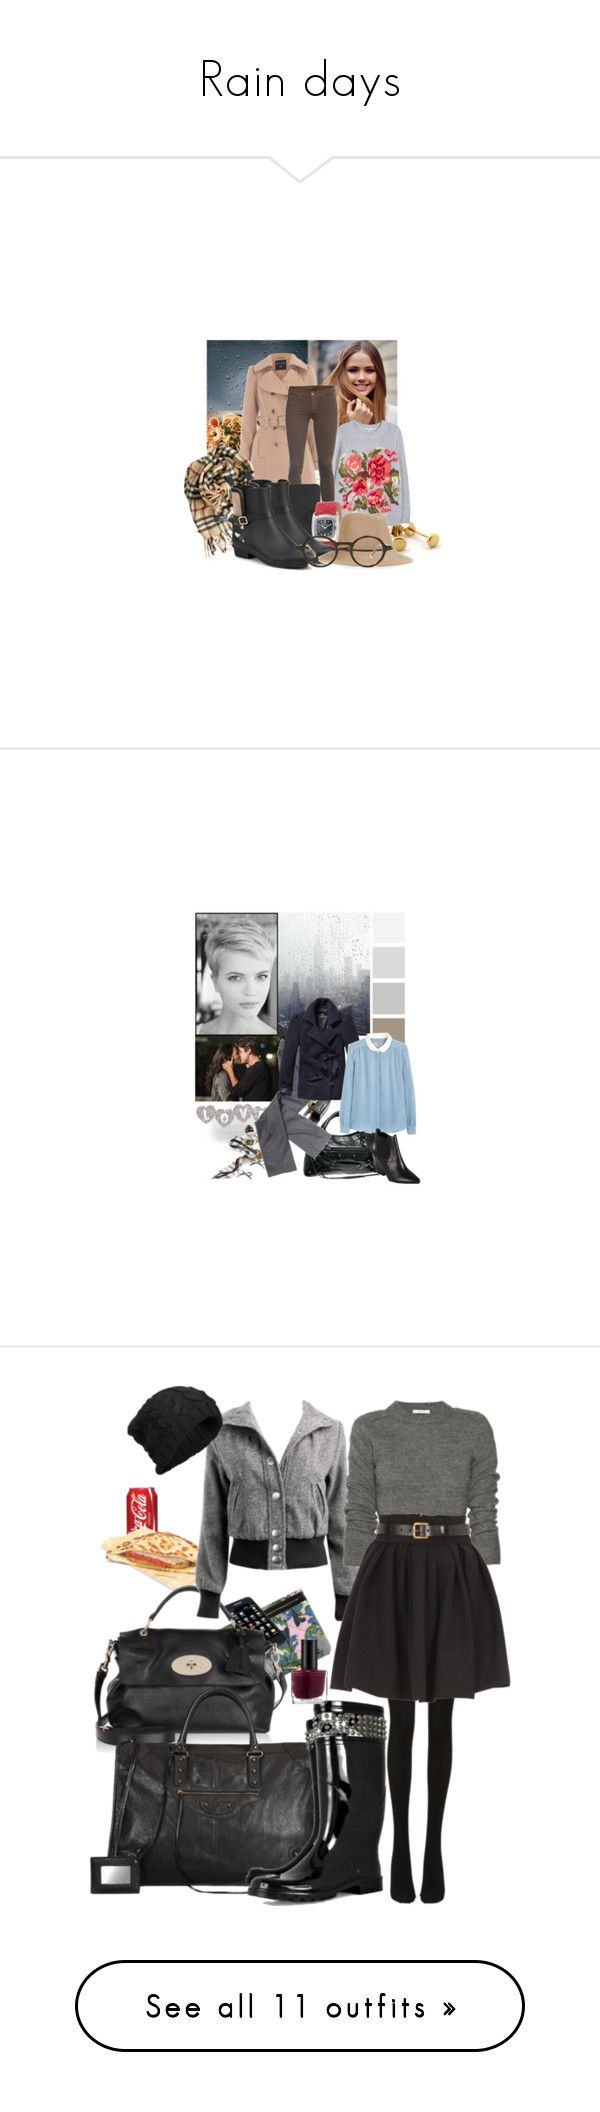 """Rain days"" by chiarastella ❤ liked on Polyvore featuring Dorothy Perkins, Joie, J Brand, MICHAEL Michael Kors, Burberry, Salvatore Ferragamo, Steven Alan, Barton Perreira, hat and rainlook"